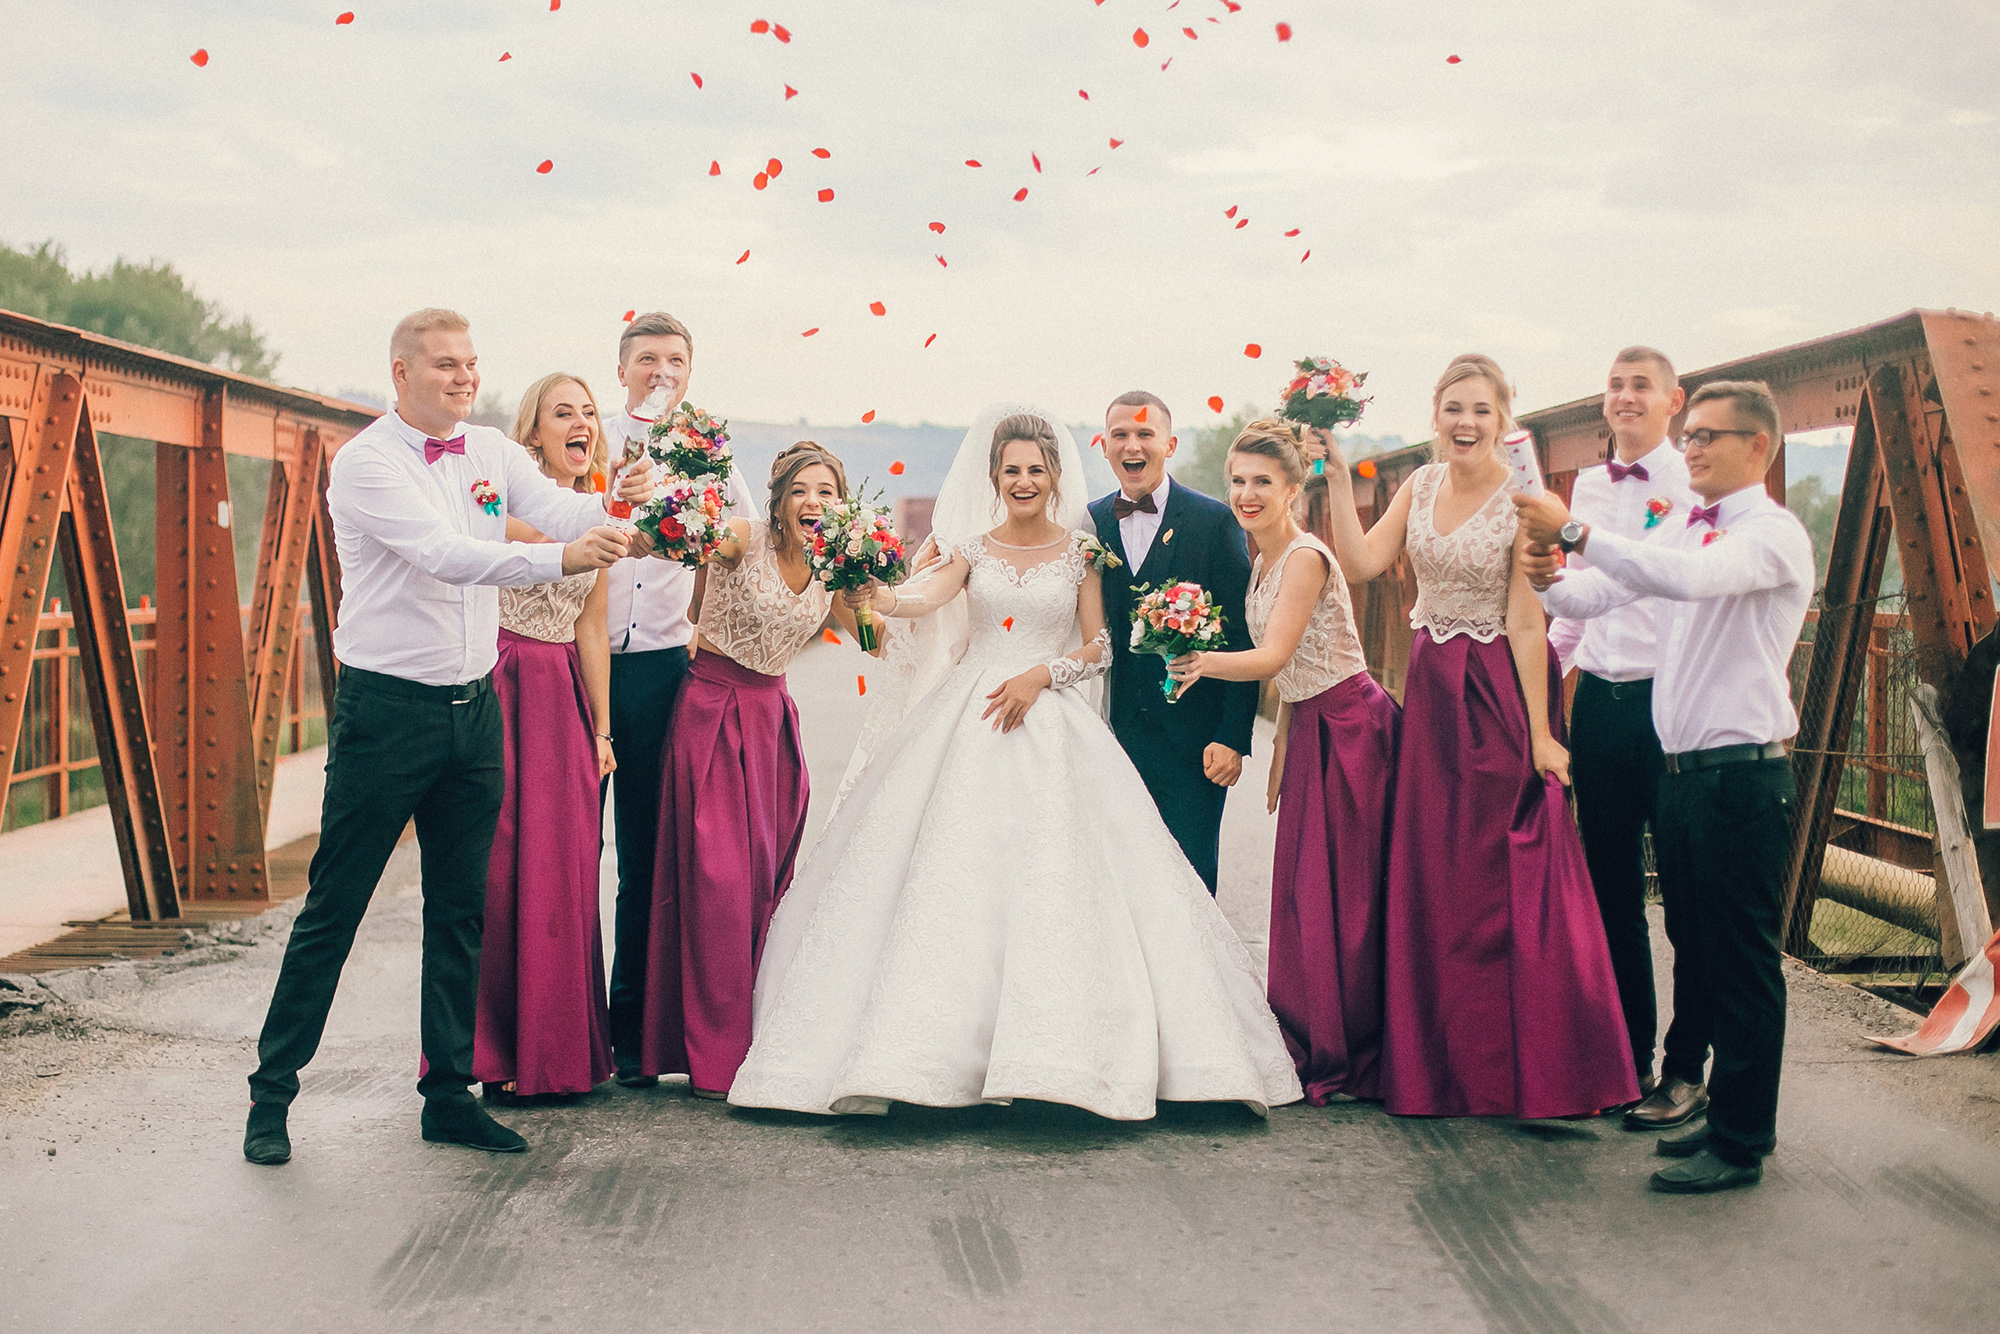 family wedding photography tips